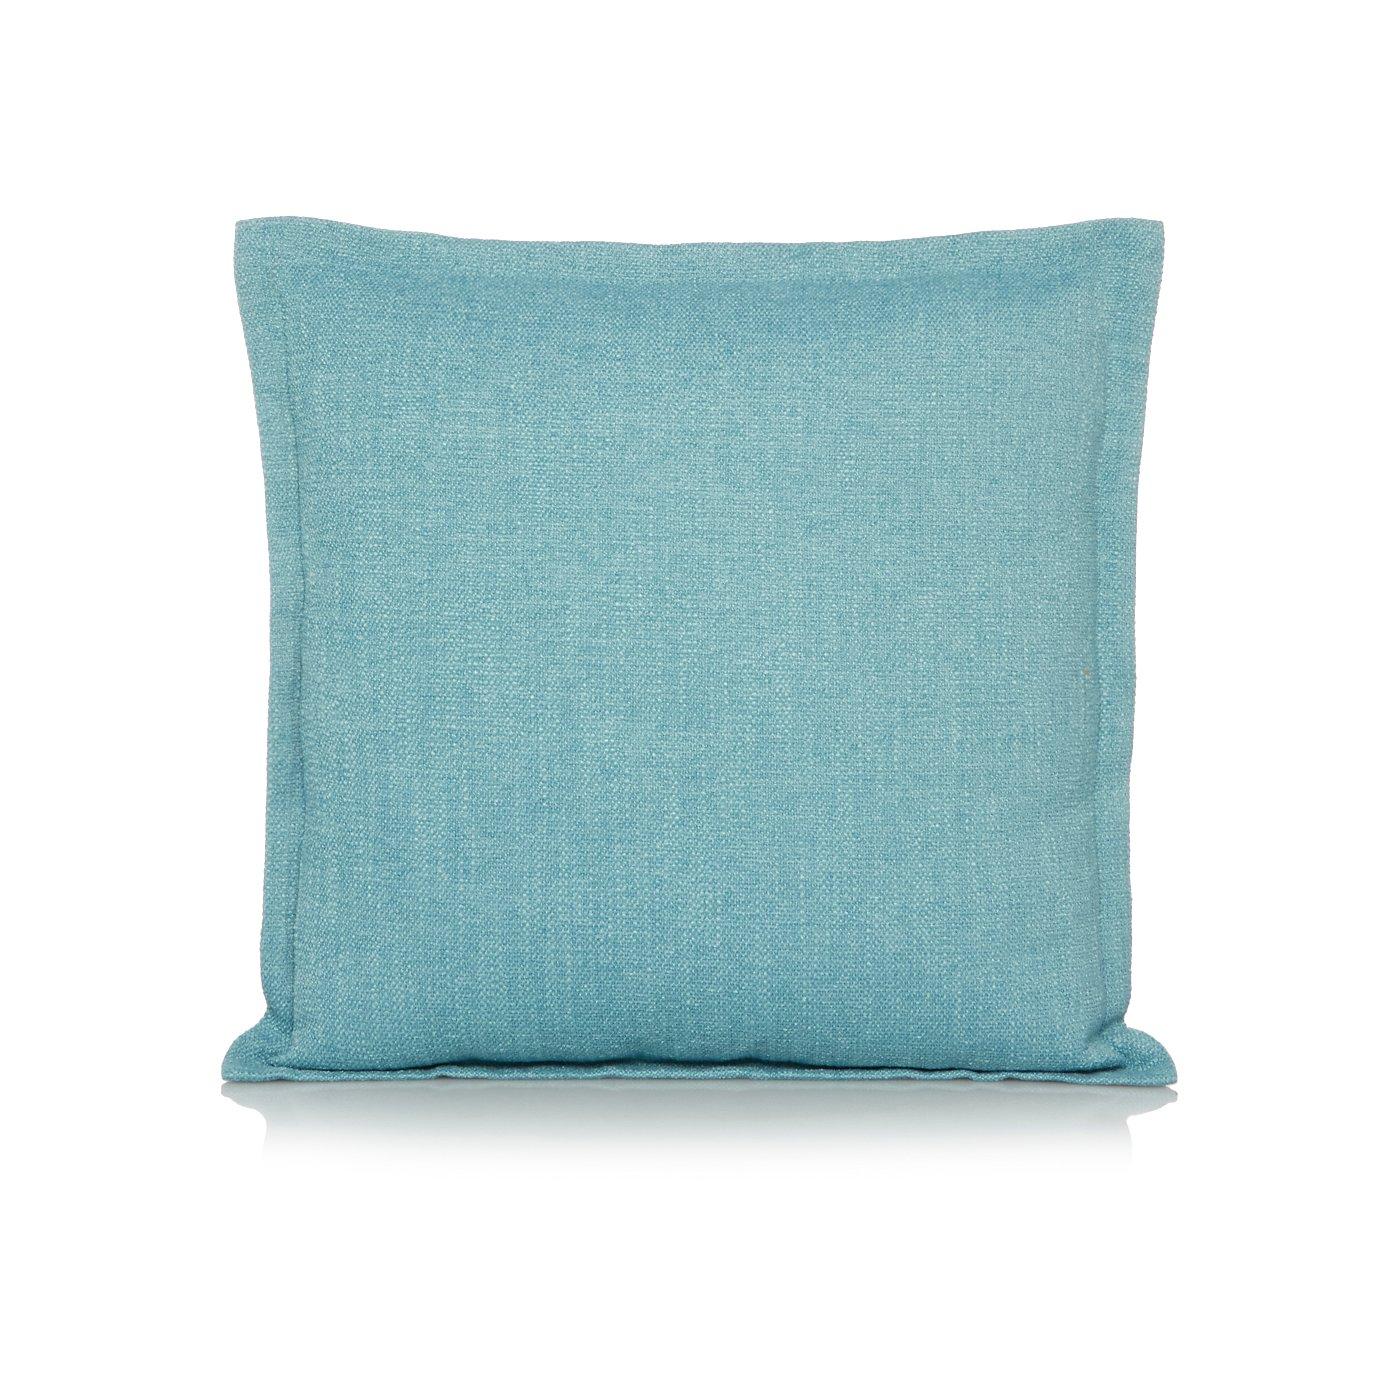 Textured Teal Range | Cushions & Throws | George at ASDA